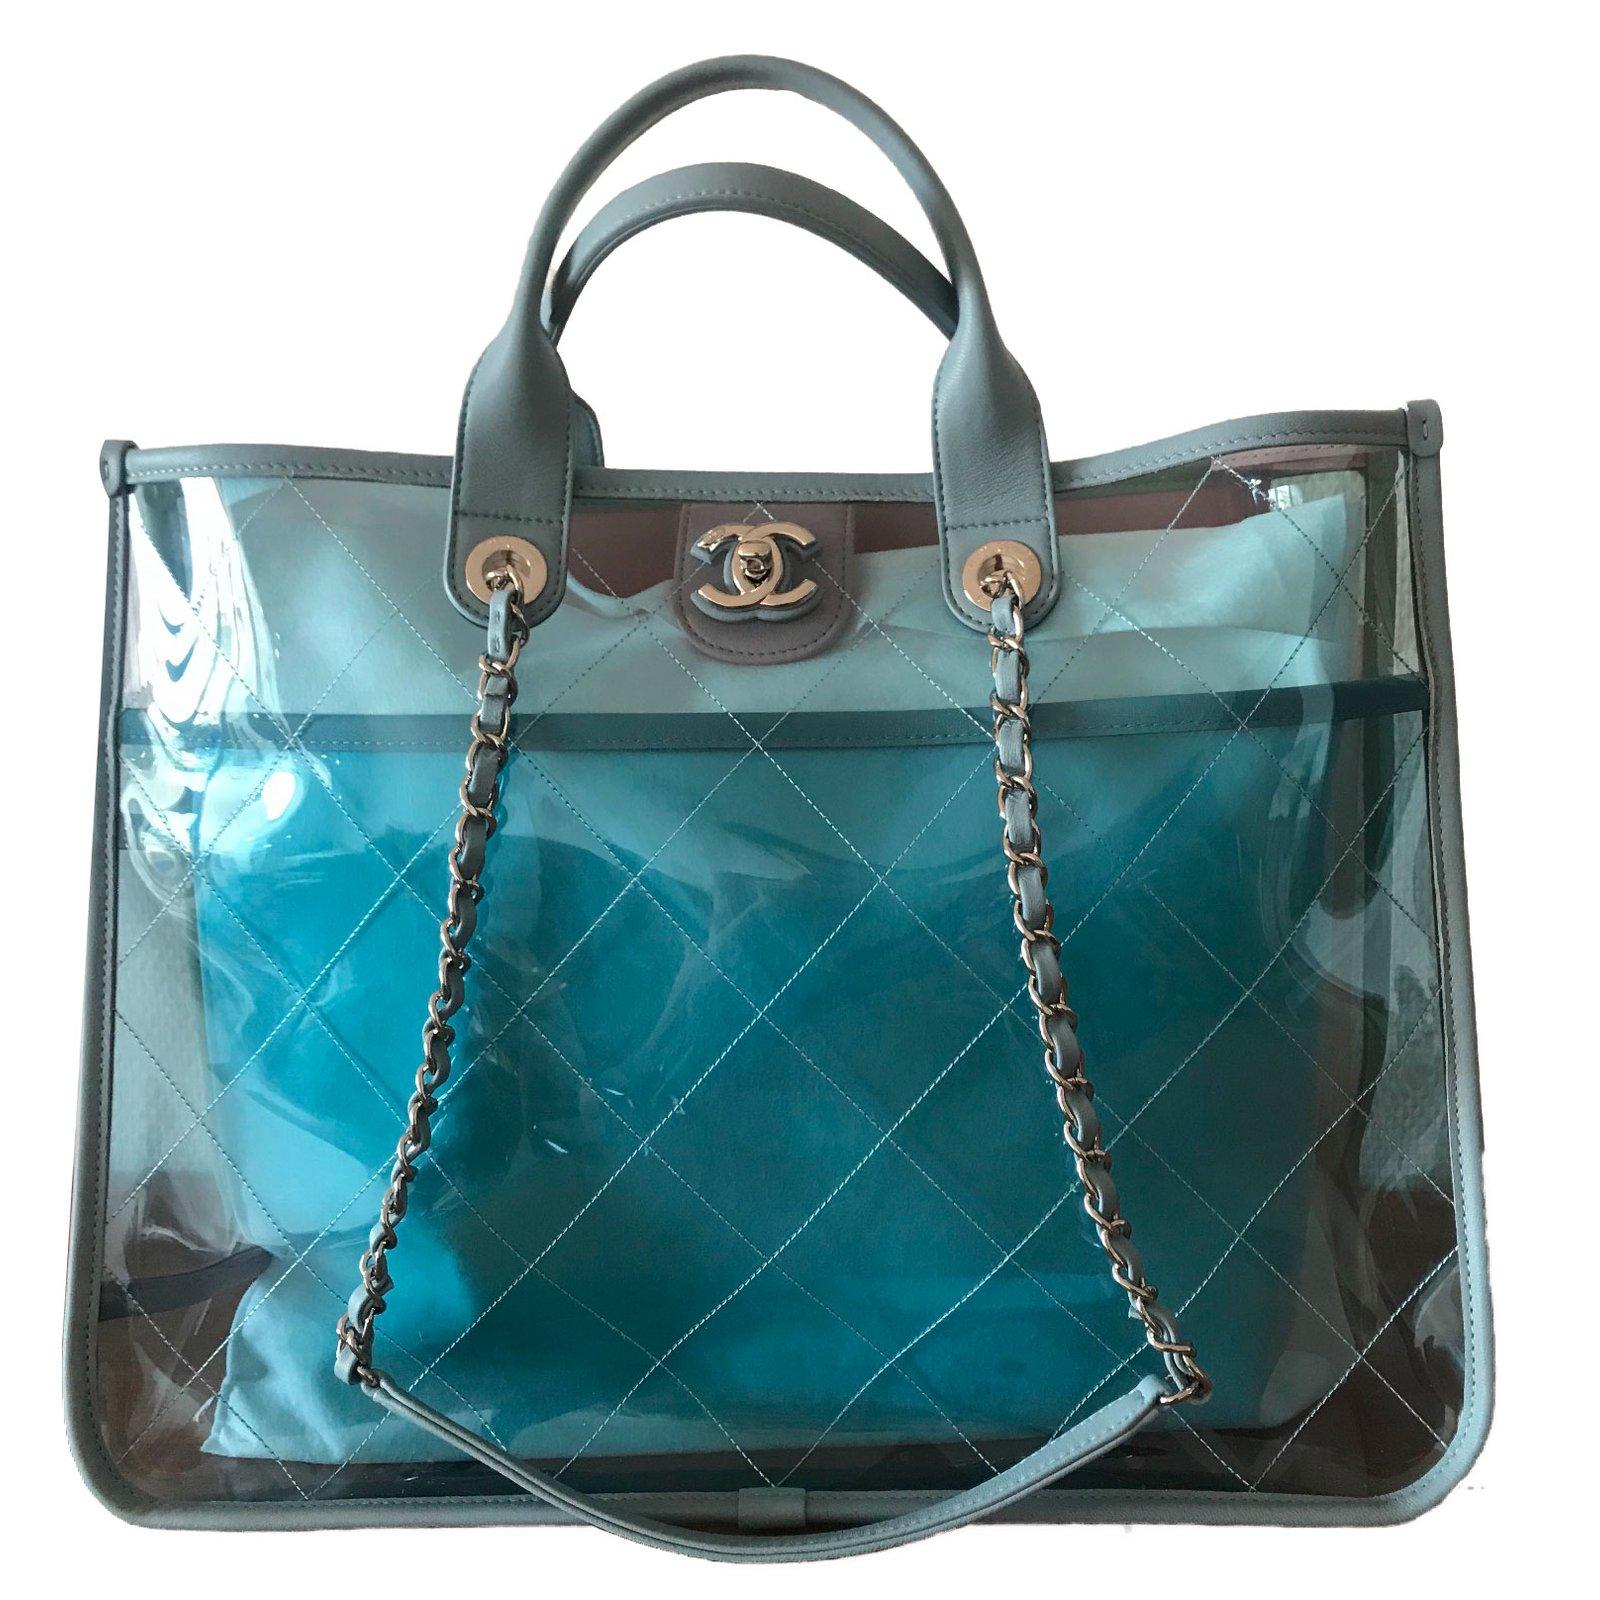 fc14d7bb0f0350 Chanel Handbag Handbags Plastic Blue ref.73749 - Joli Closet